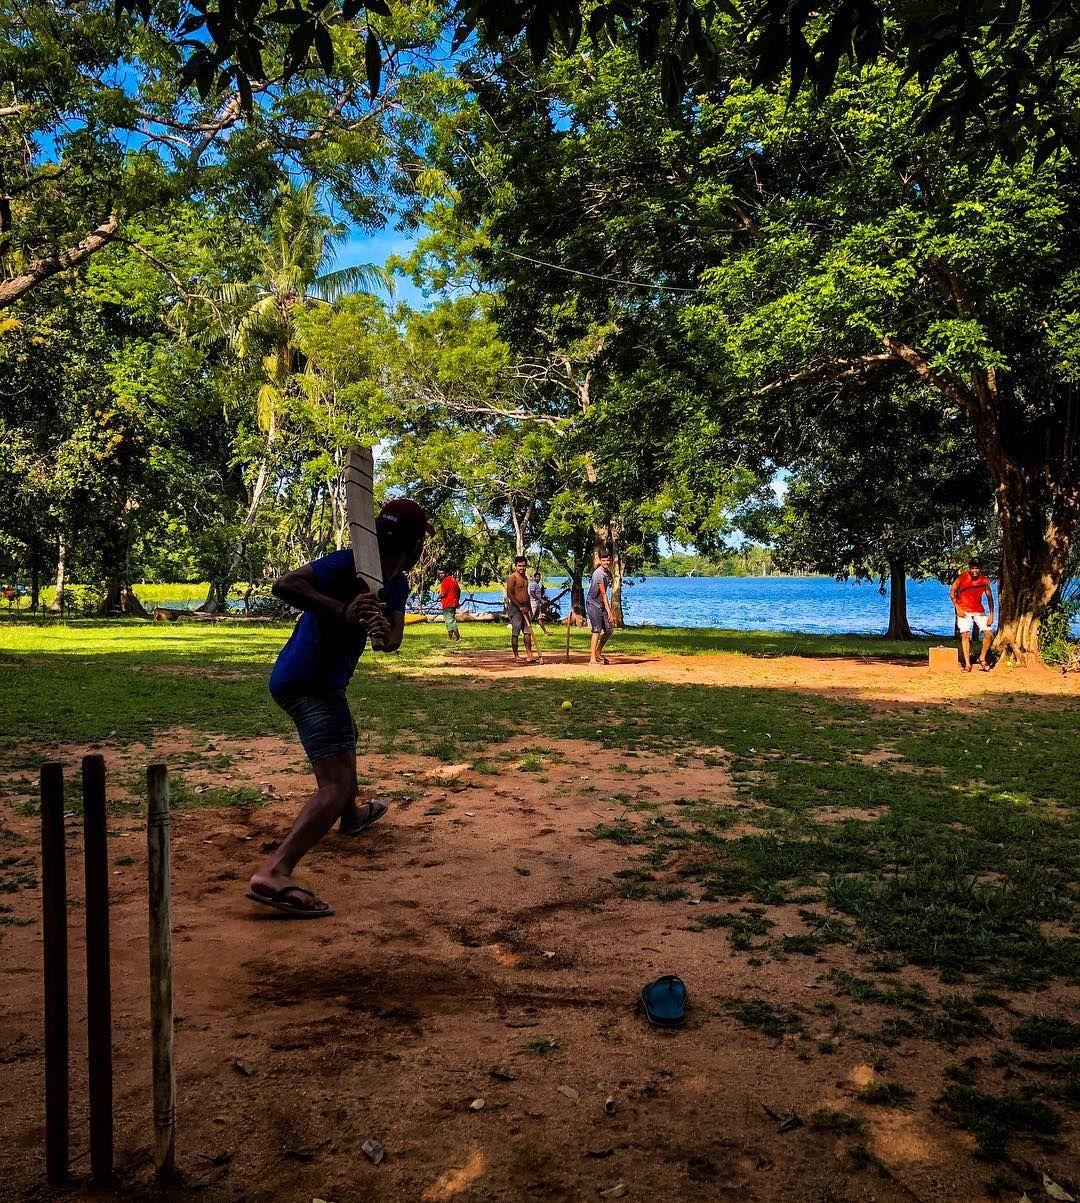 Cricket by the lake srilankan srilanka lake lakeside